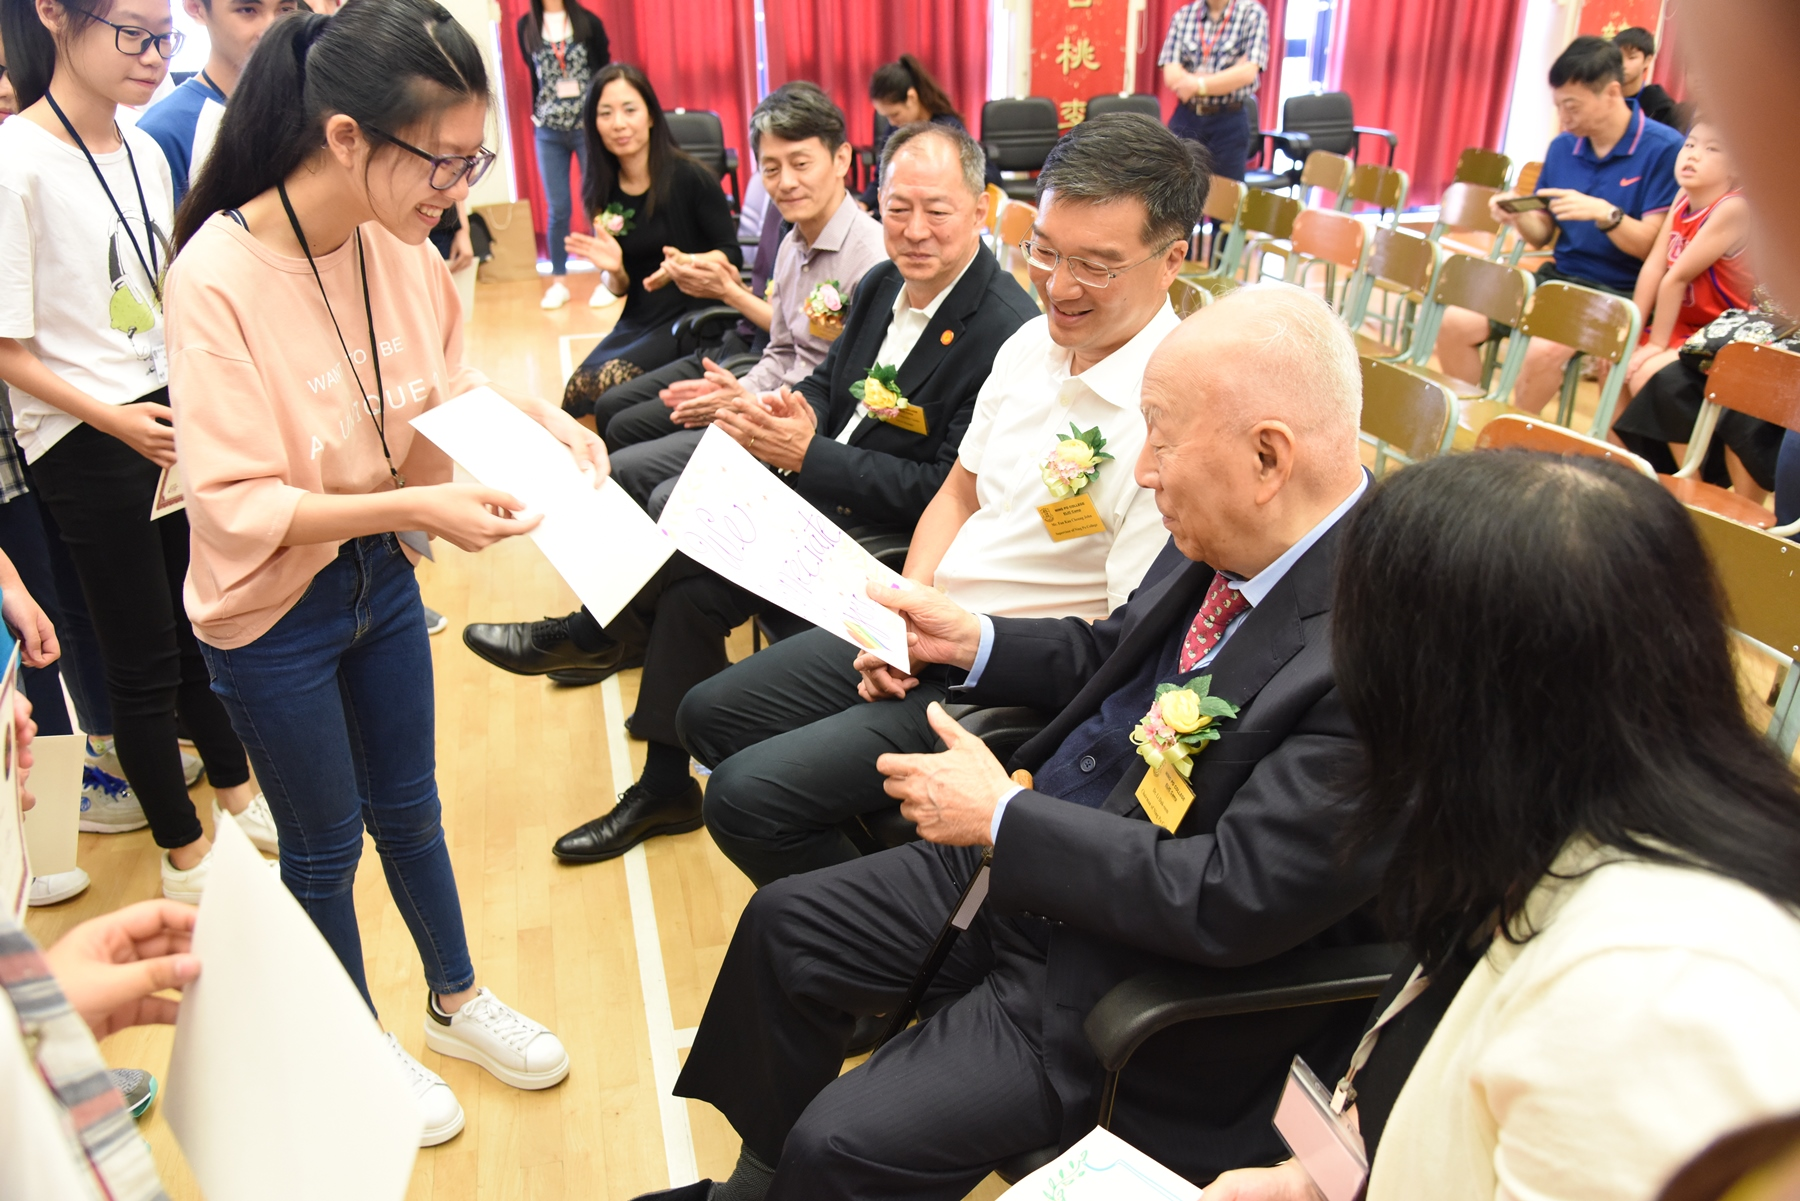 http://www.npc.edu.hk/sites/default/files/dsc_0263_1.jpg